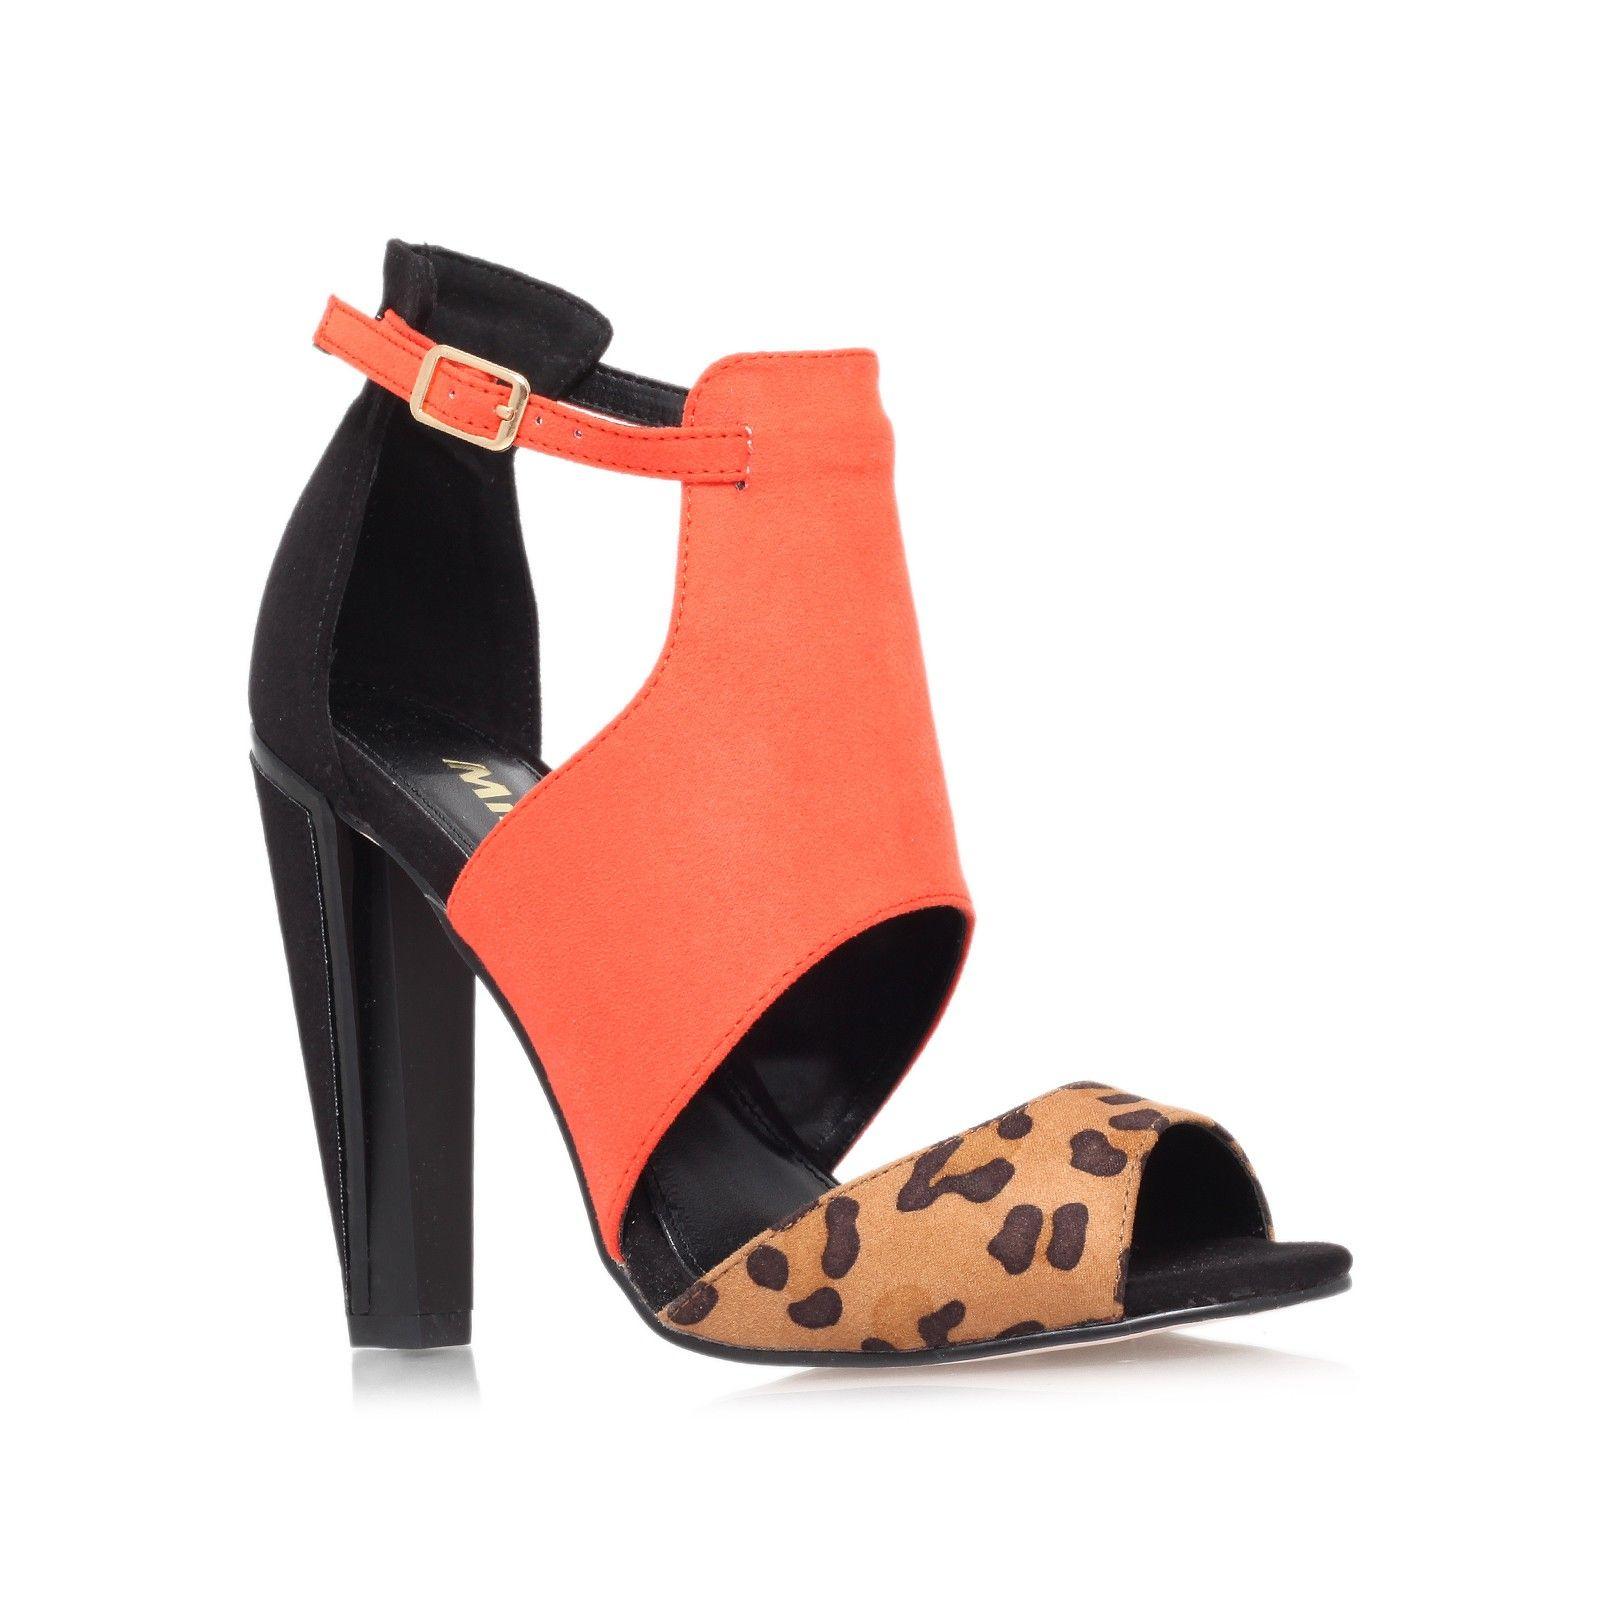 Black sandals debenhams - Miss Kg Multi Coloured Earl High Heeled Court Shoe At Debenhams